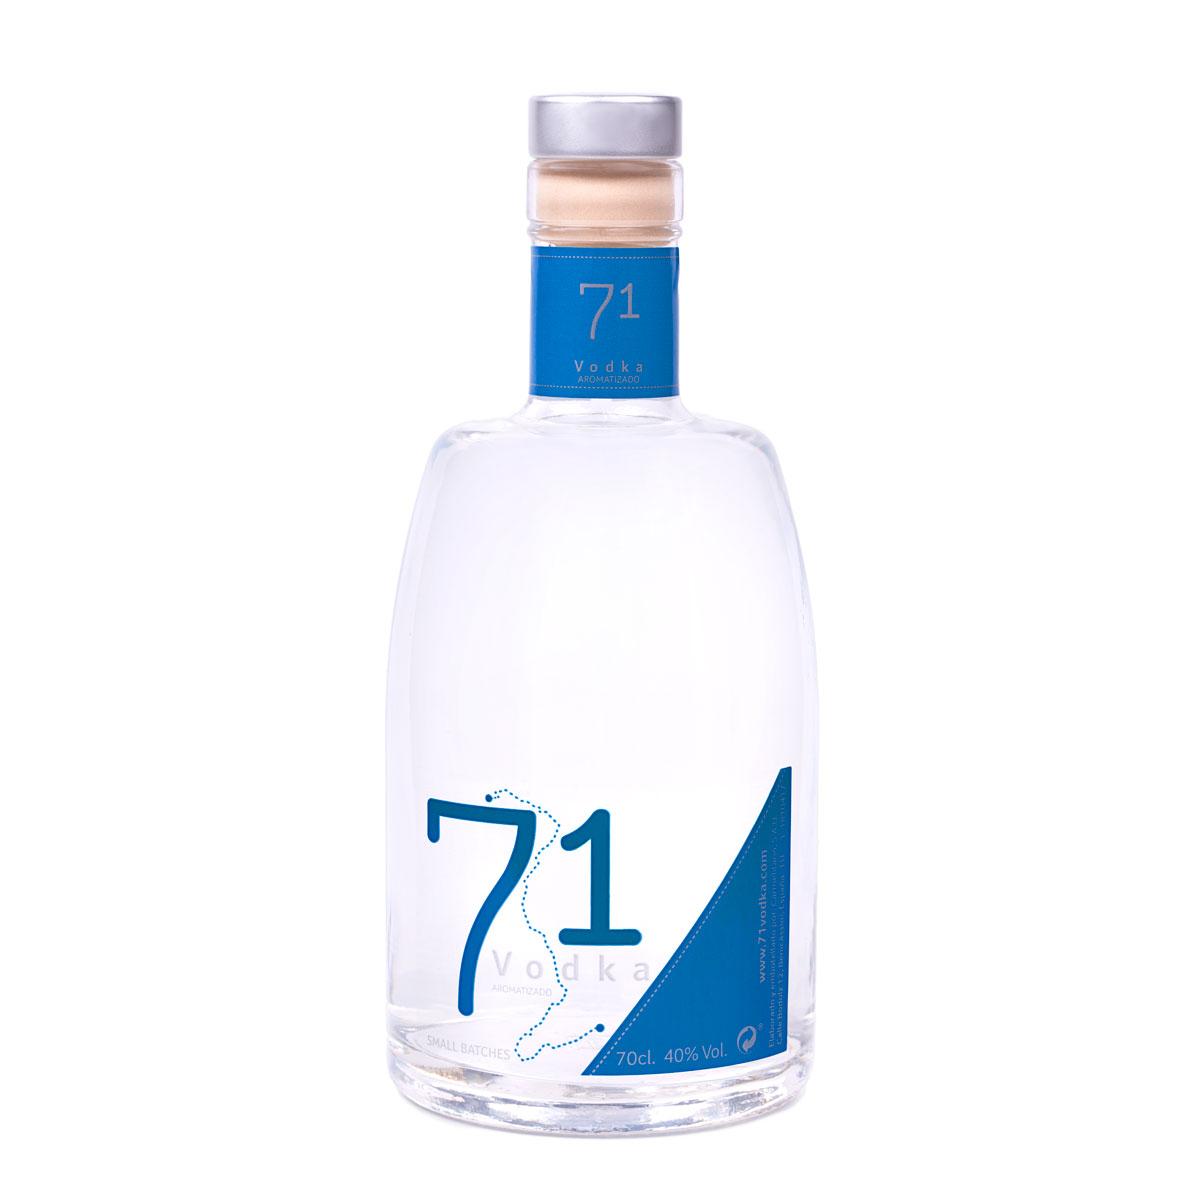 71 ...